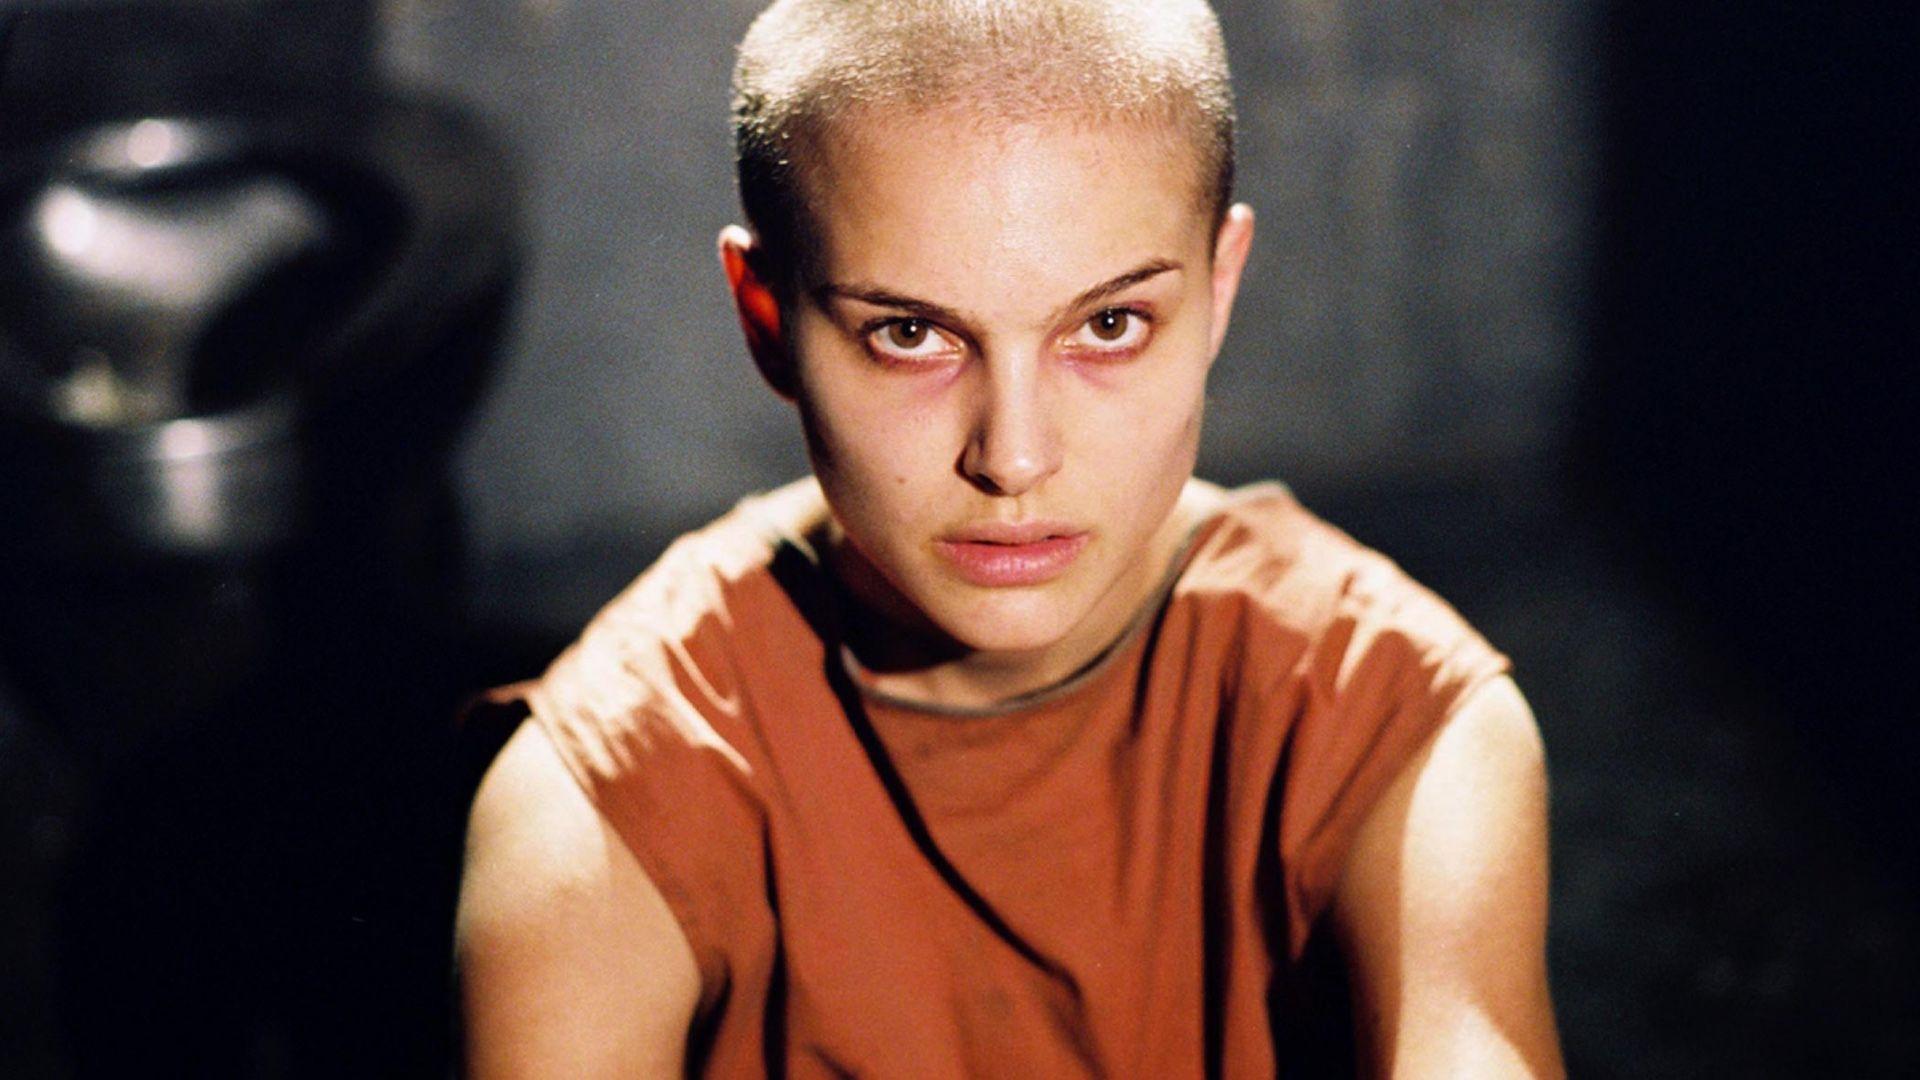 Natalie Portman Wants To Make a V FOR VENDETTA Sequel (с ...